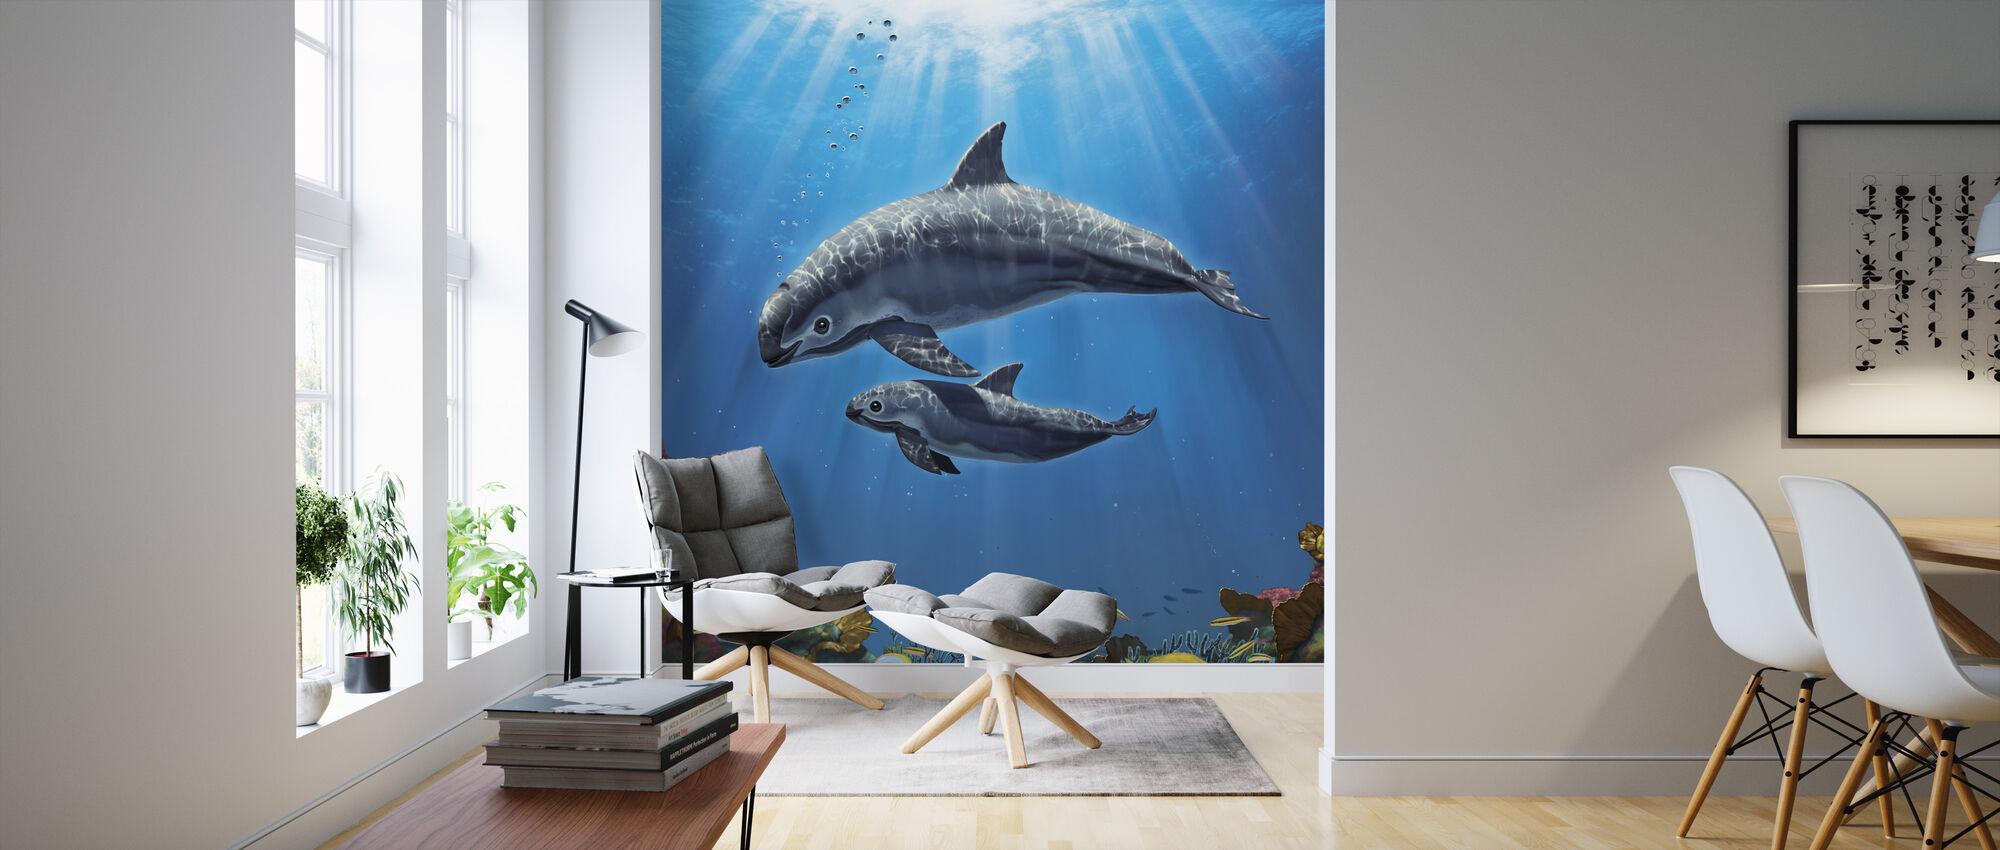 Vaquita Critically Endangered - Wallpaper - Living Room